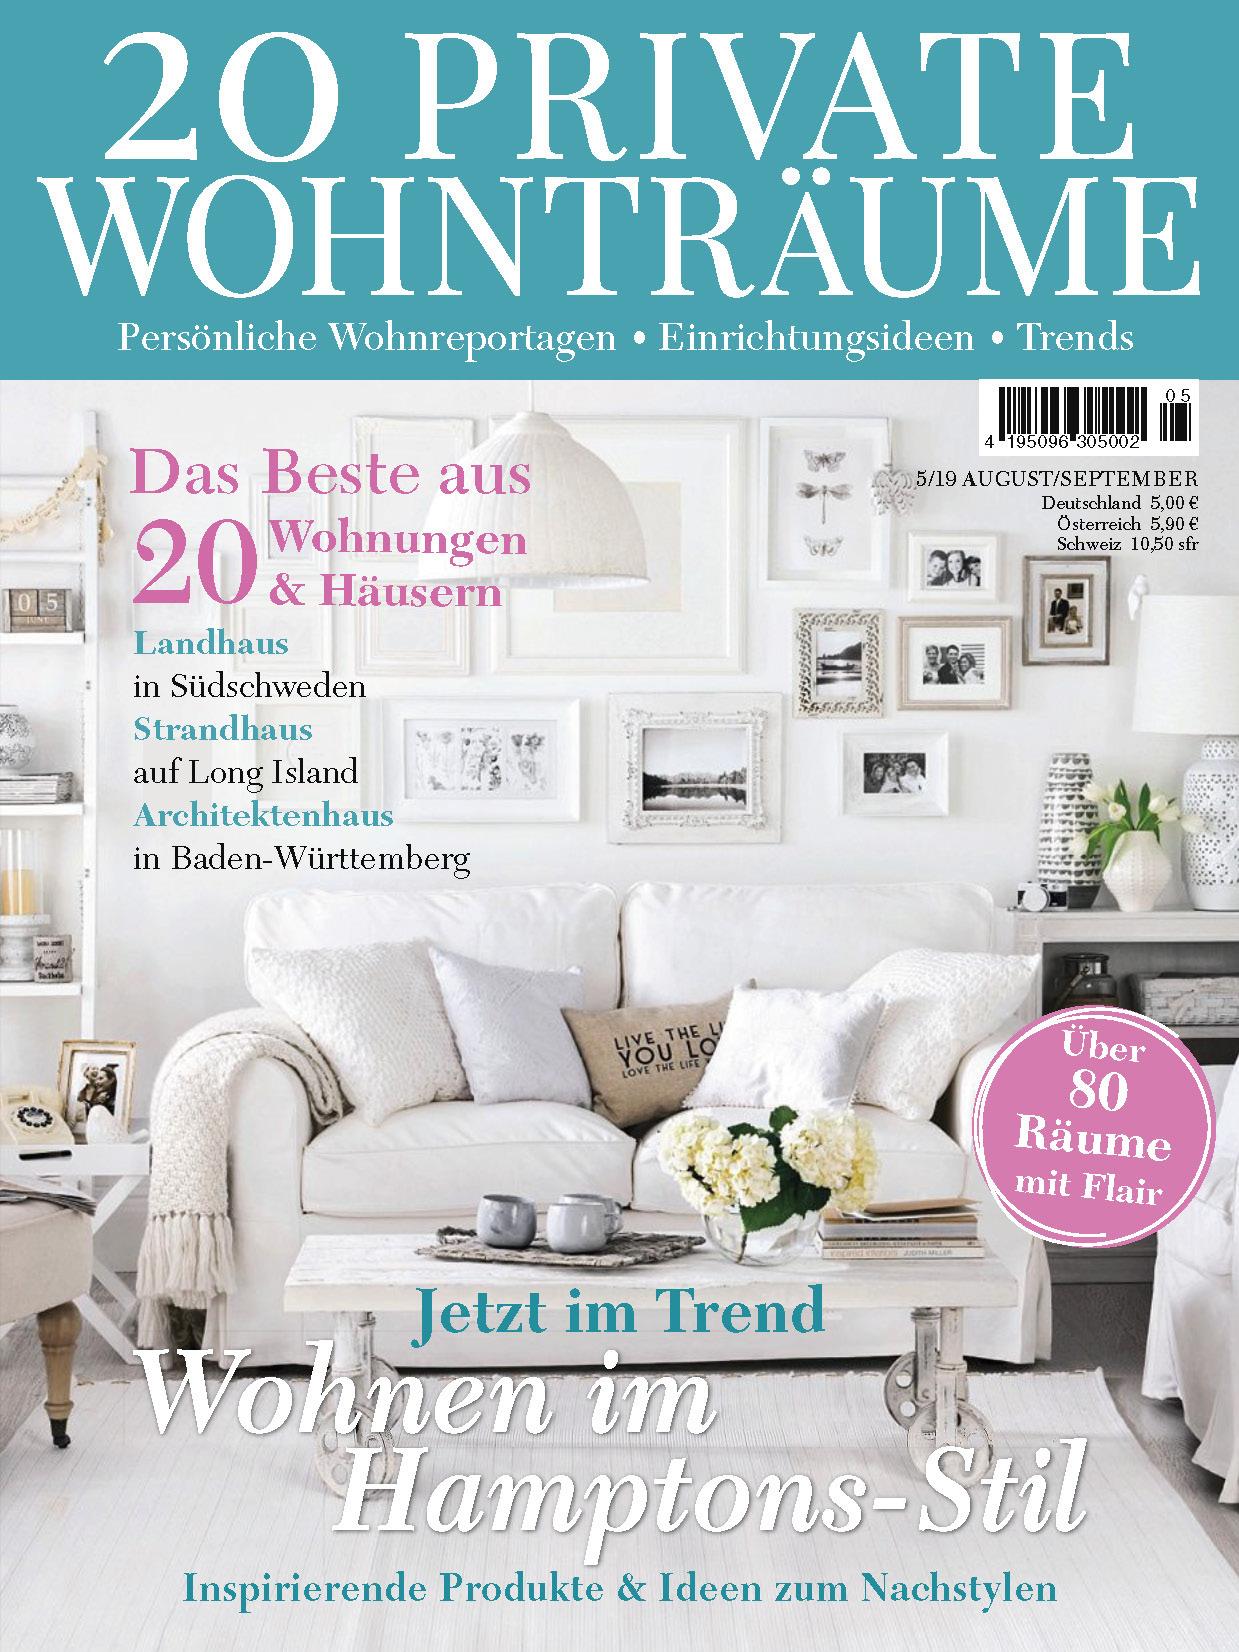 《20 Private Wohntraume》德国版室内室外设计杂志2019年08-09月号